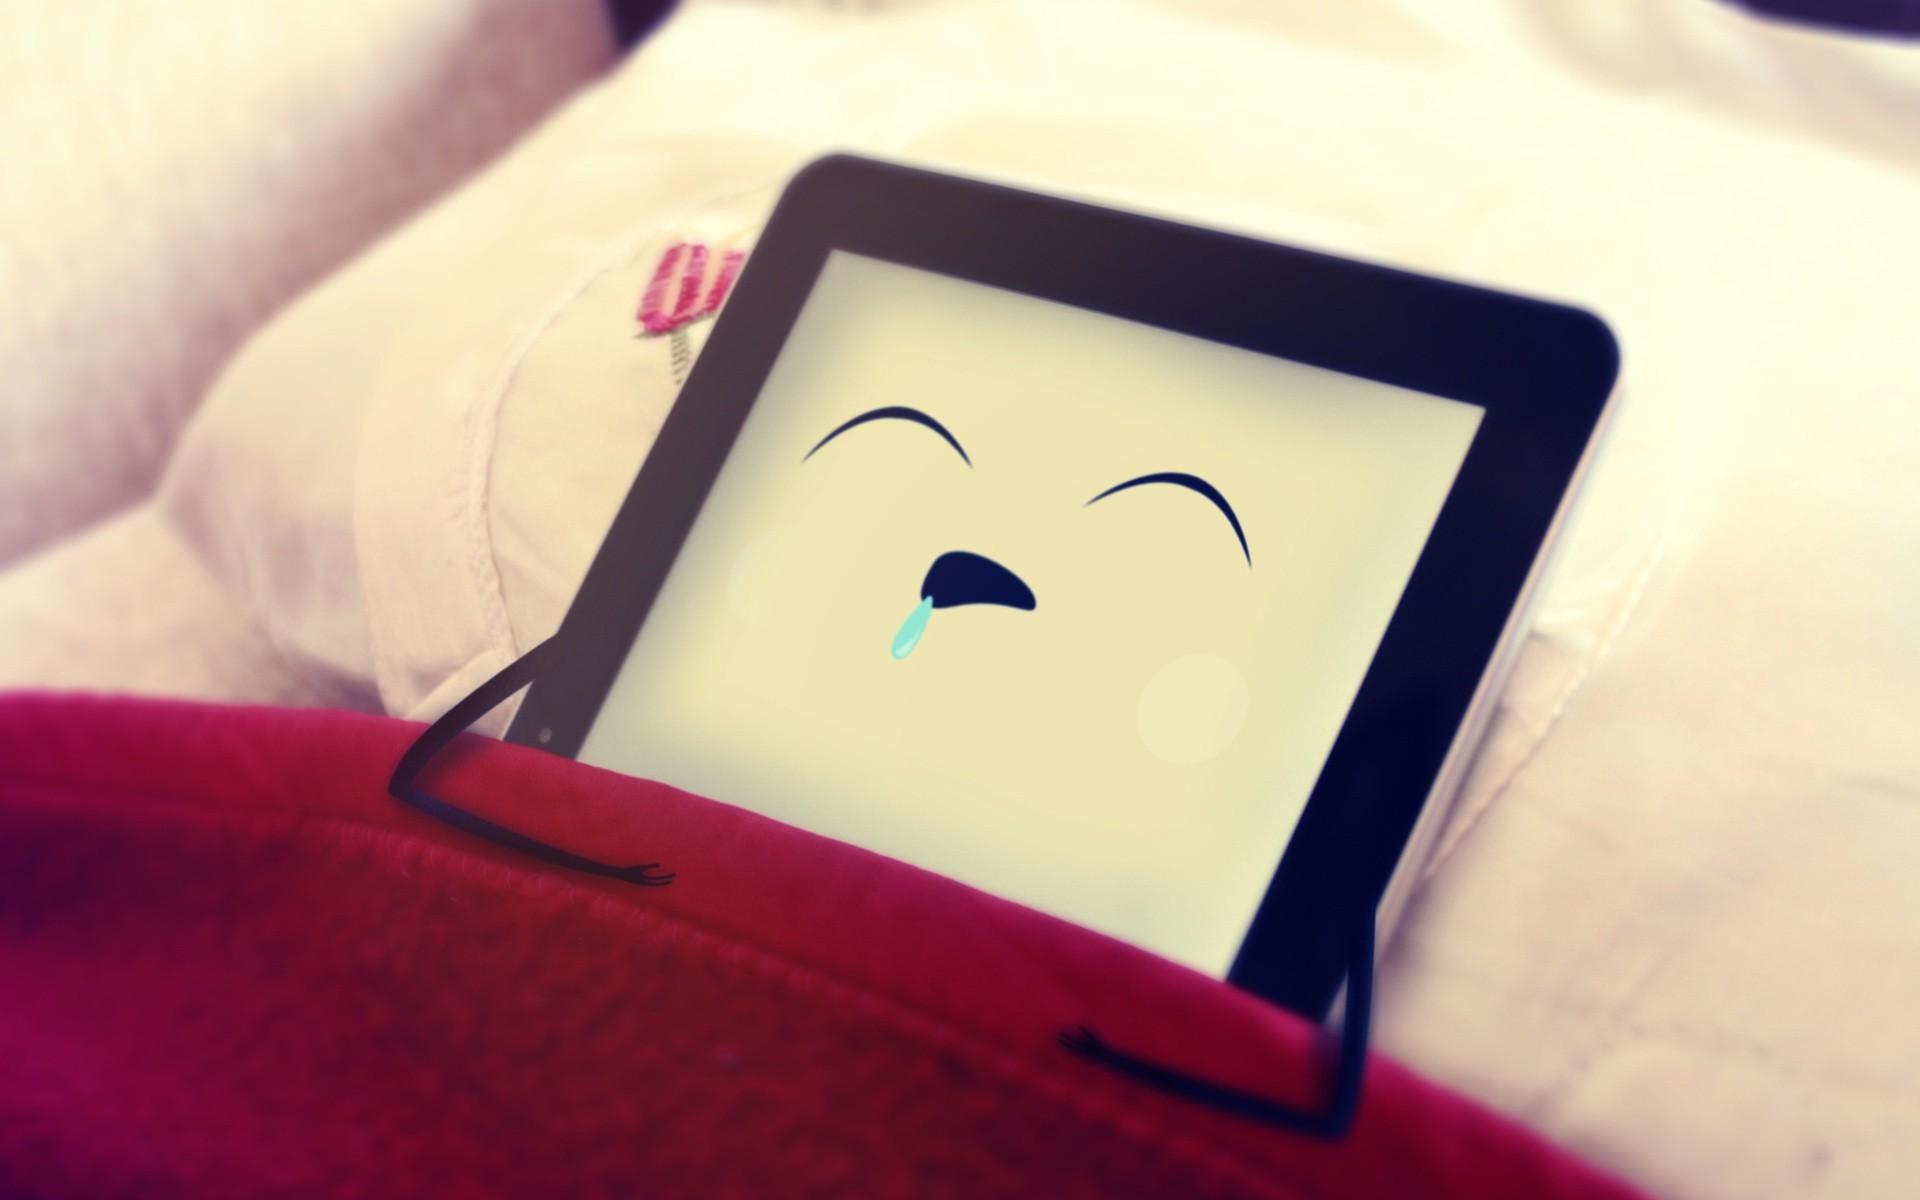 шутка, подушка, планшет - обои для ...: www.zastavki.com/rus/Funny_wallpapers/wallpaper-40730.htm